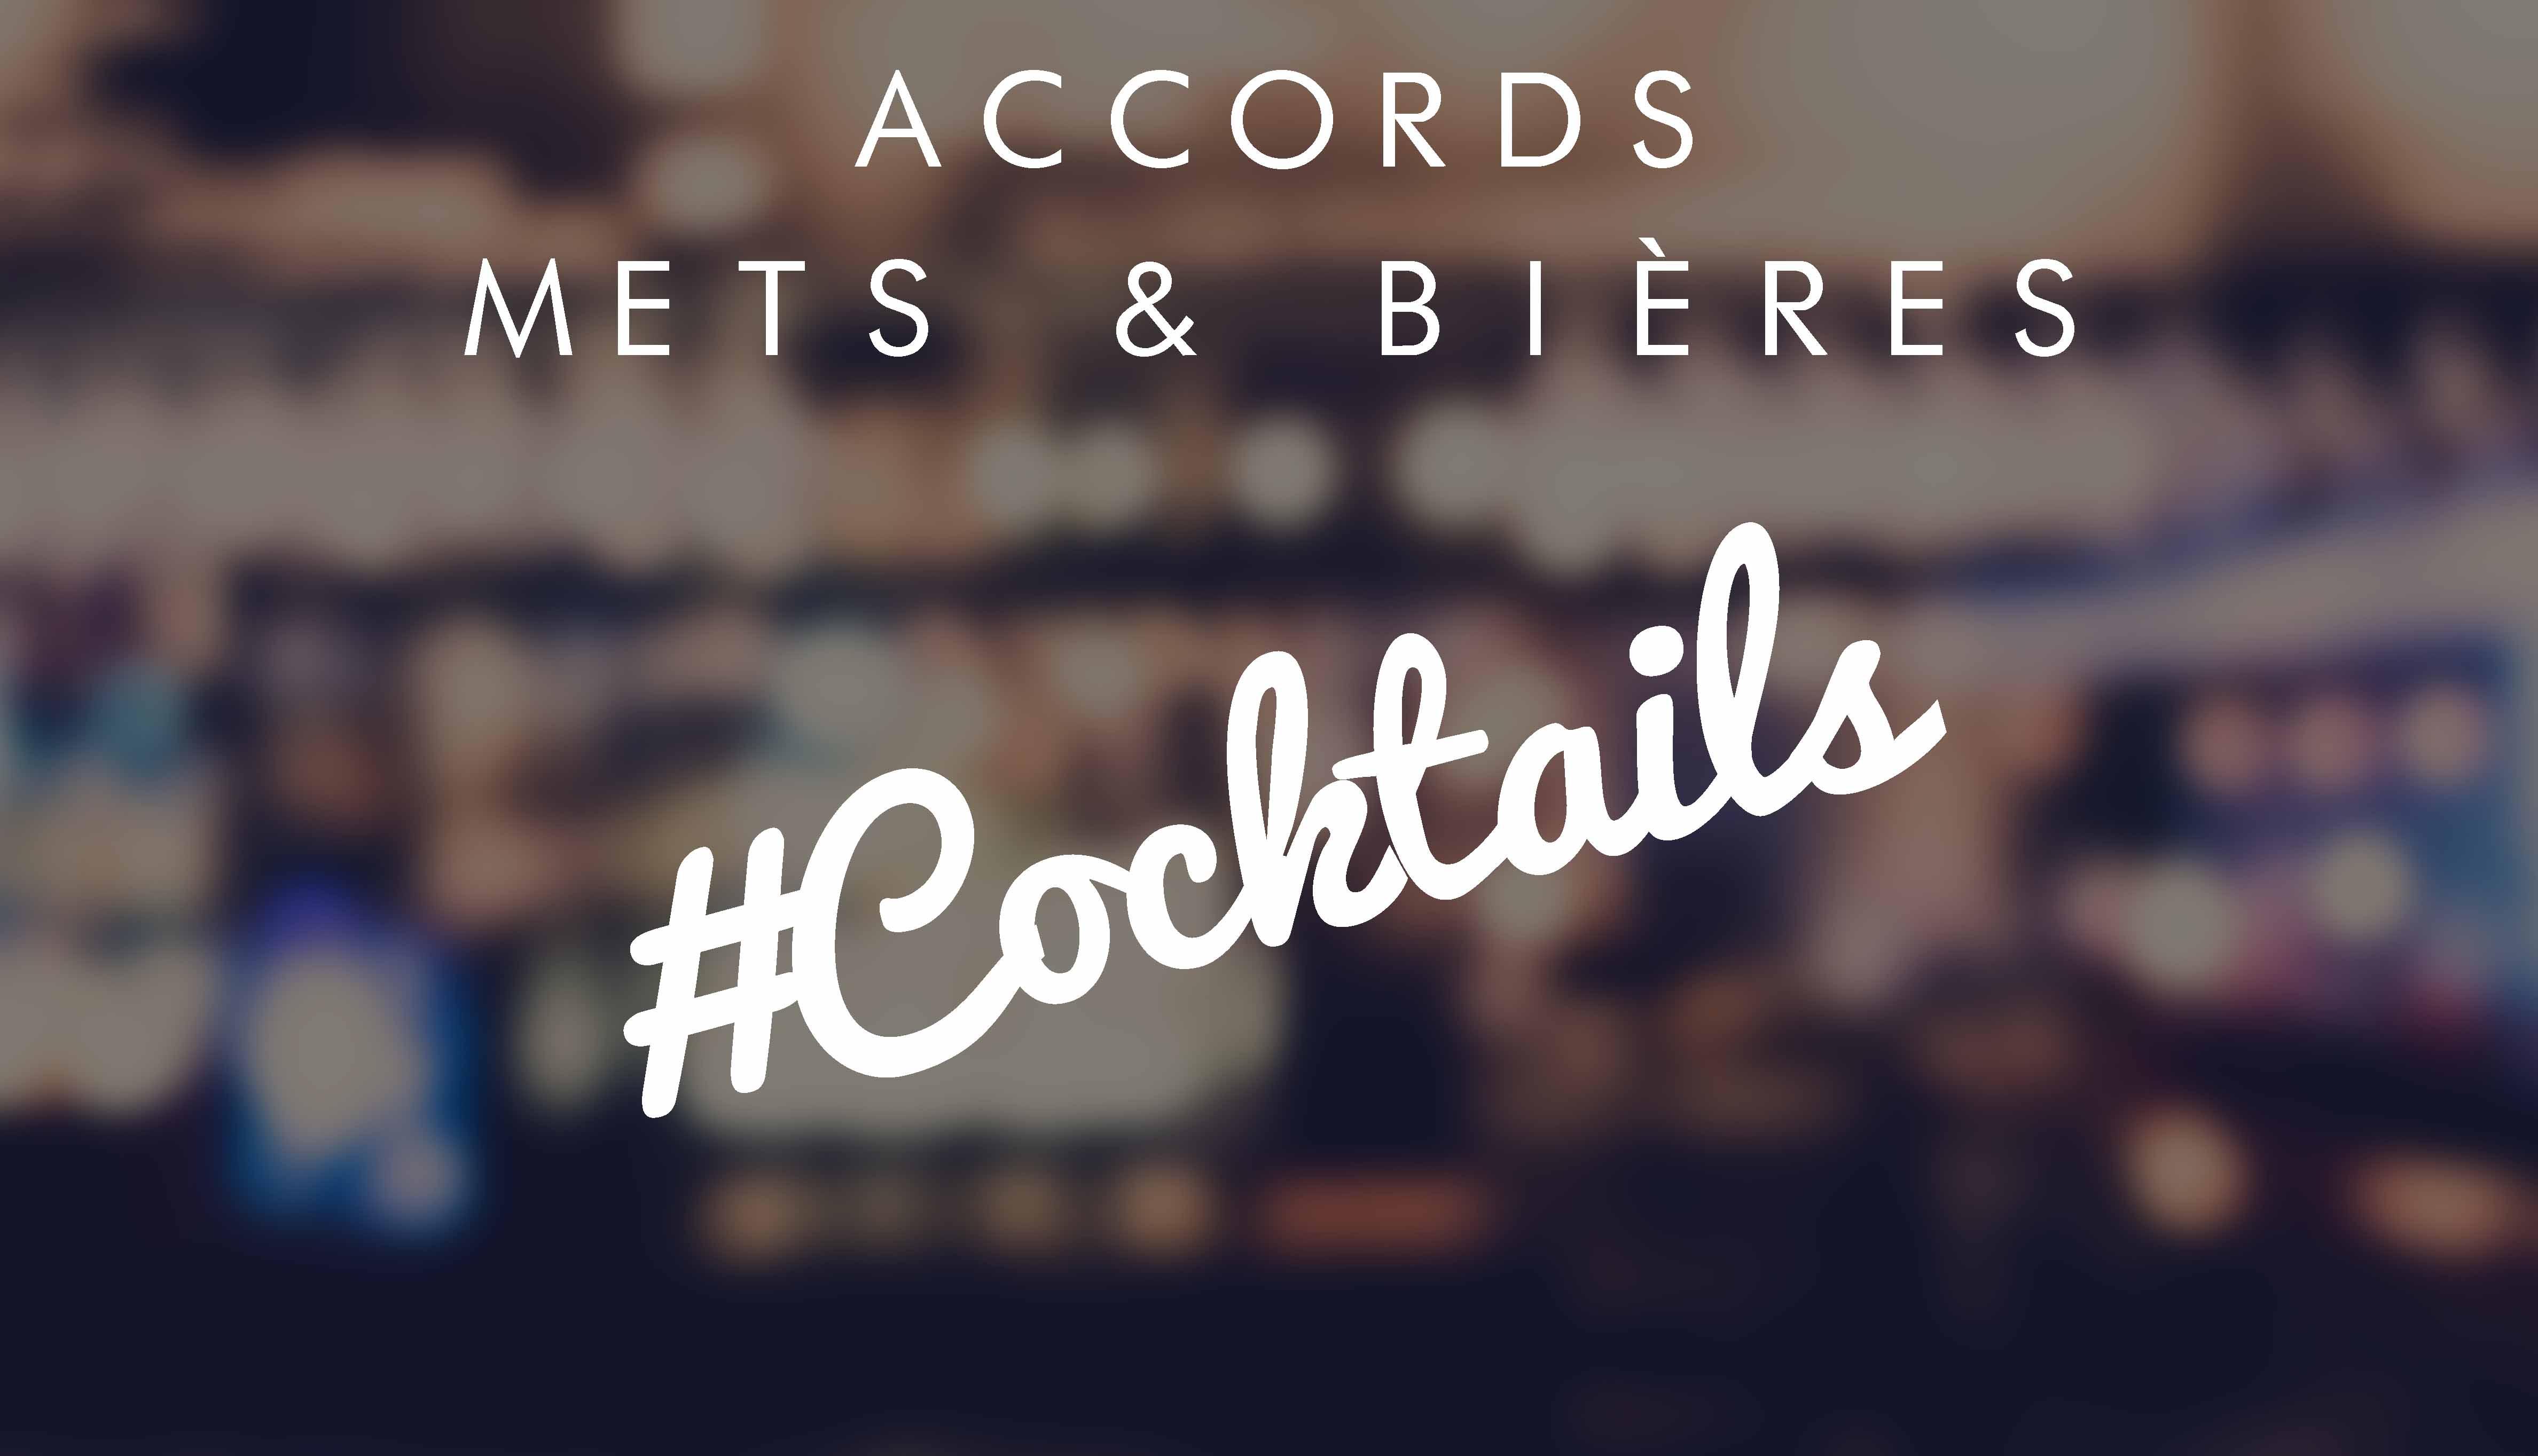 Accords Mets & Bières n°4 : Le Pulsate